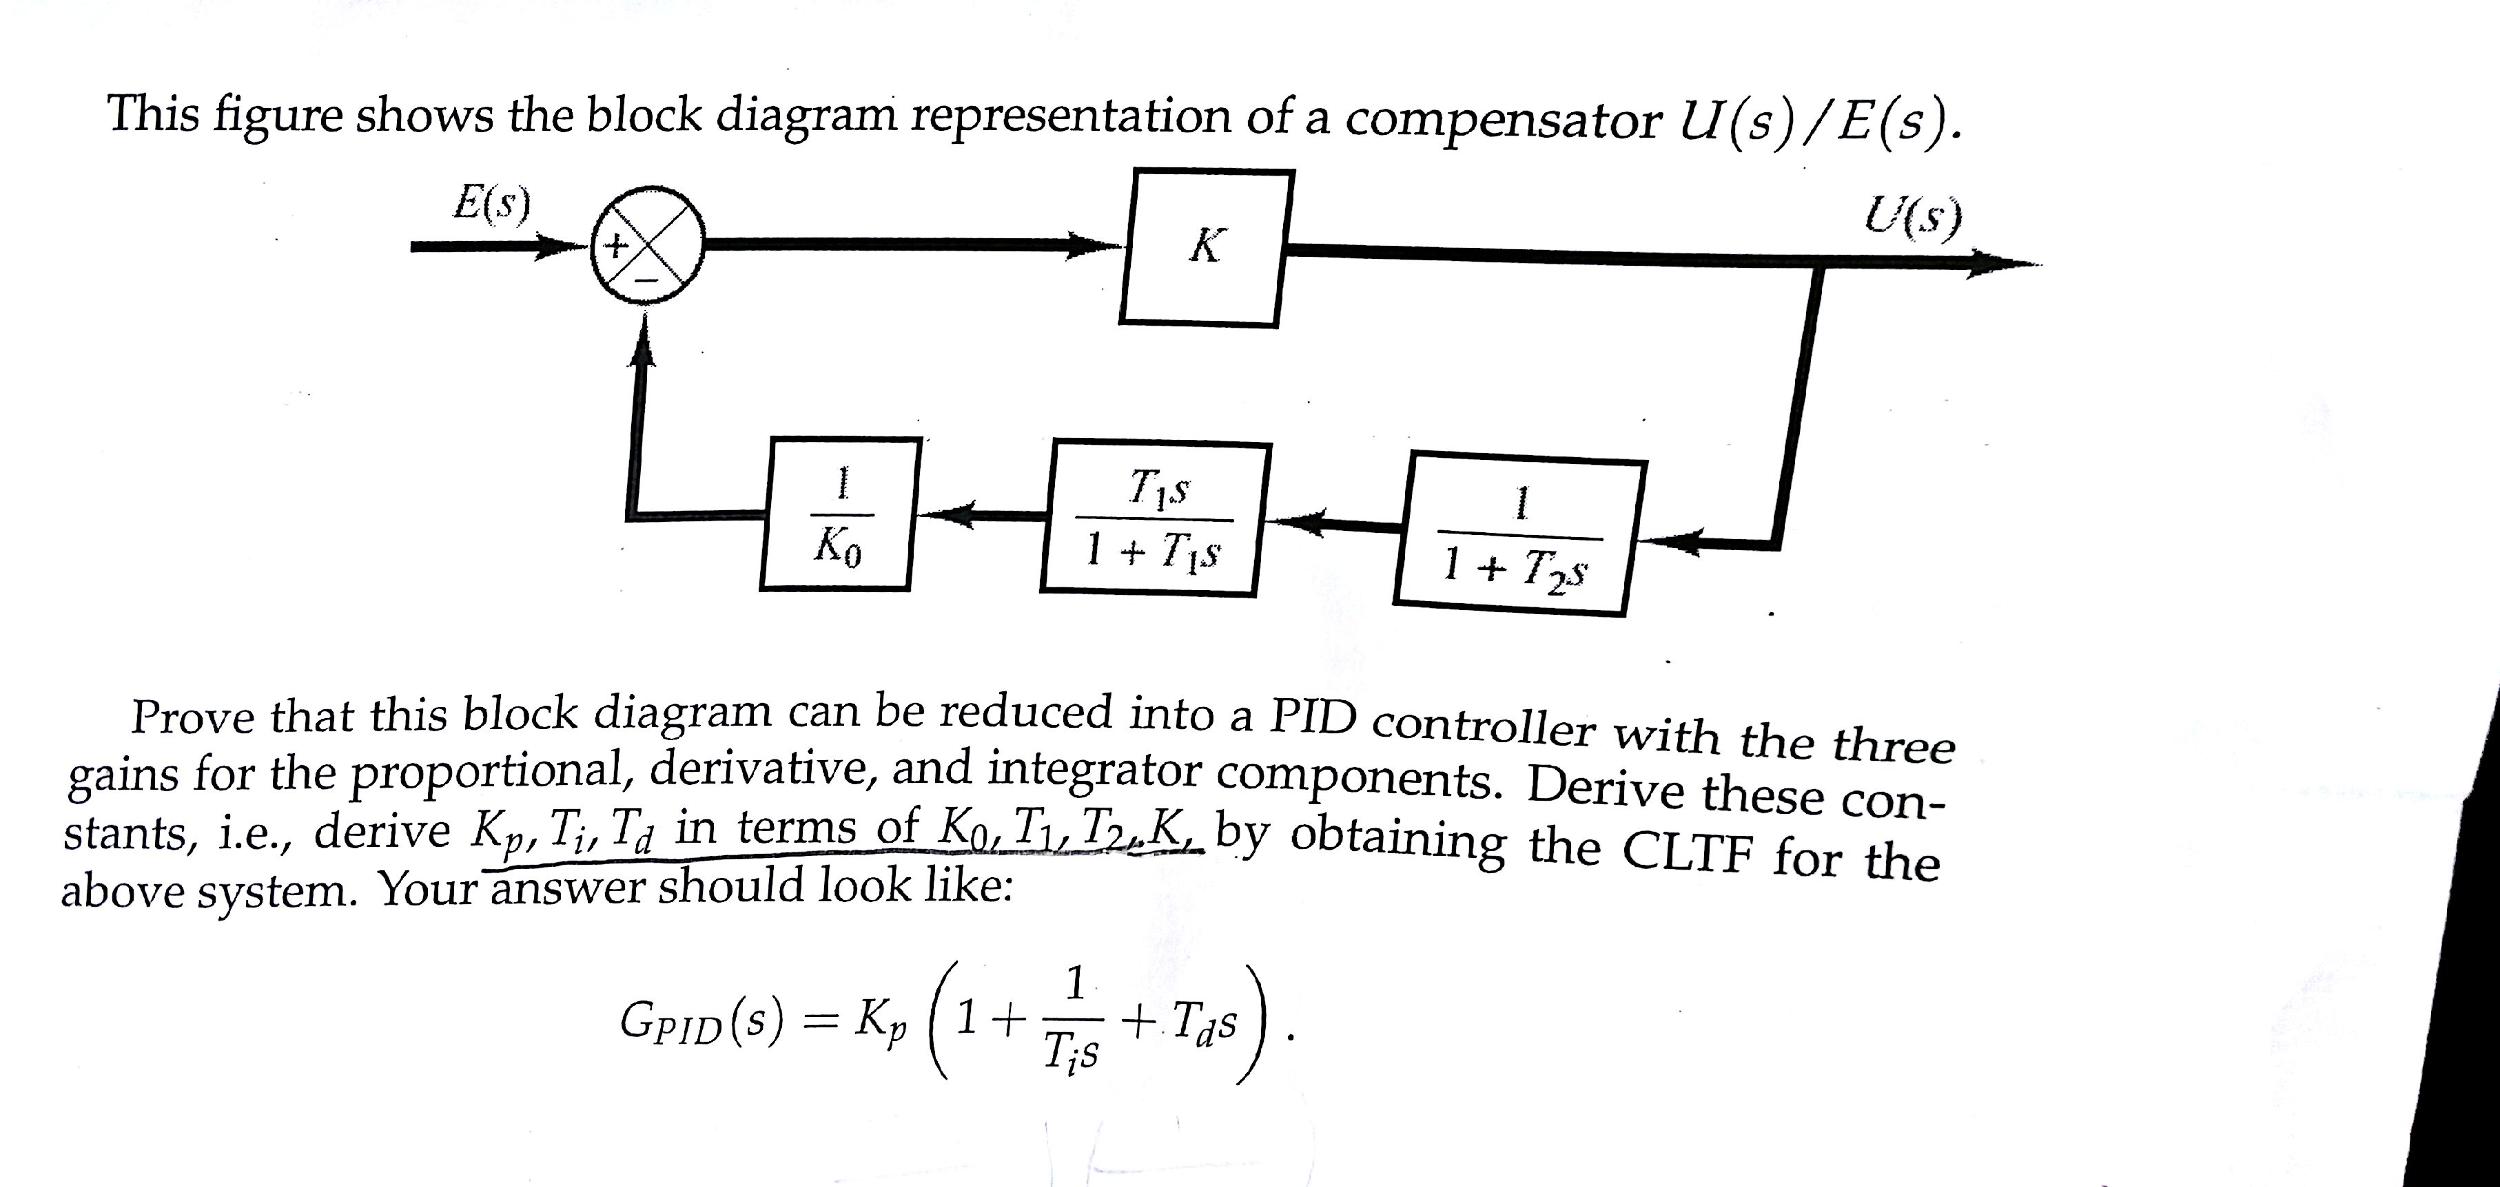 This figure shows the block diagram representation